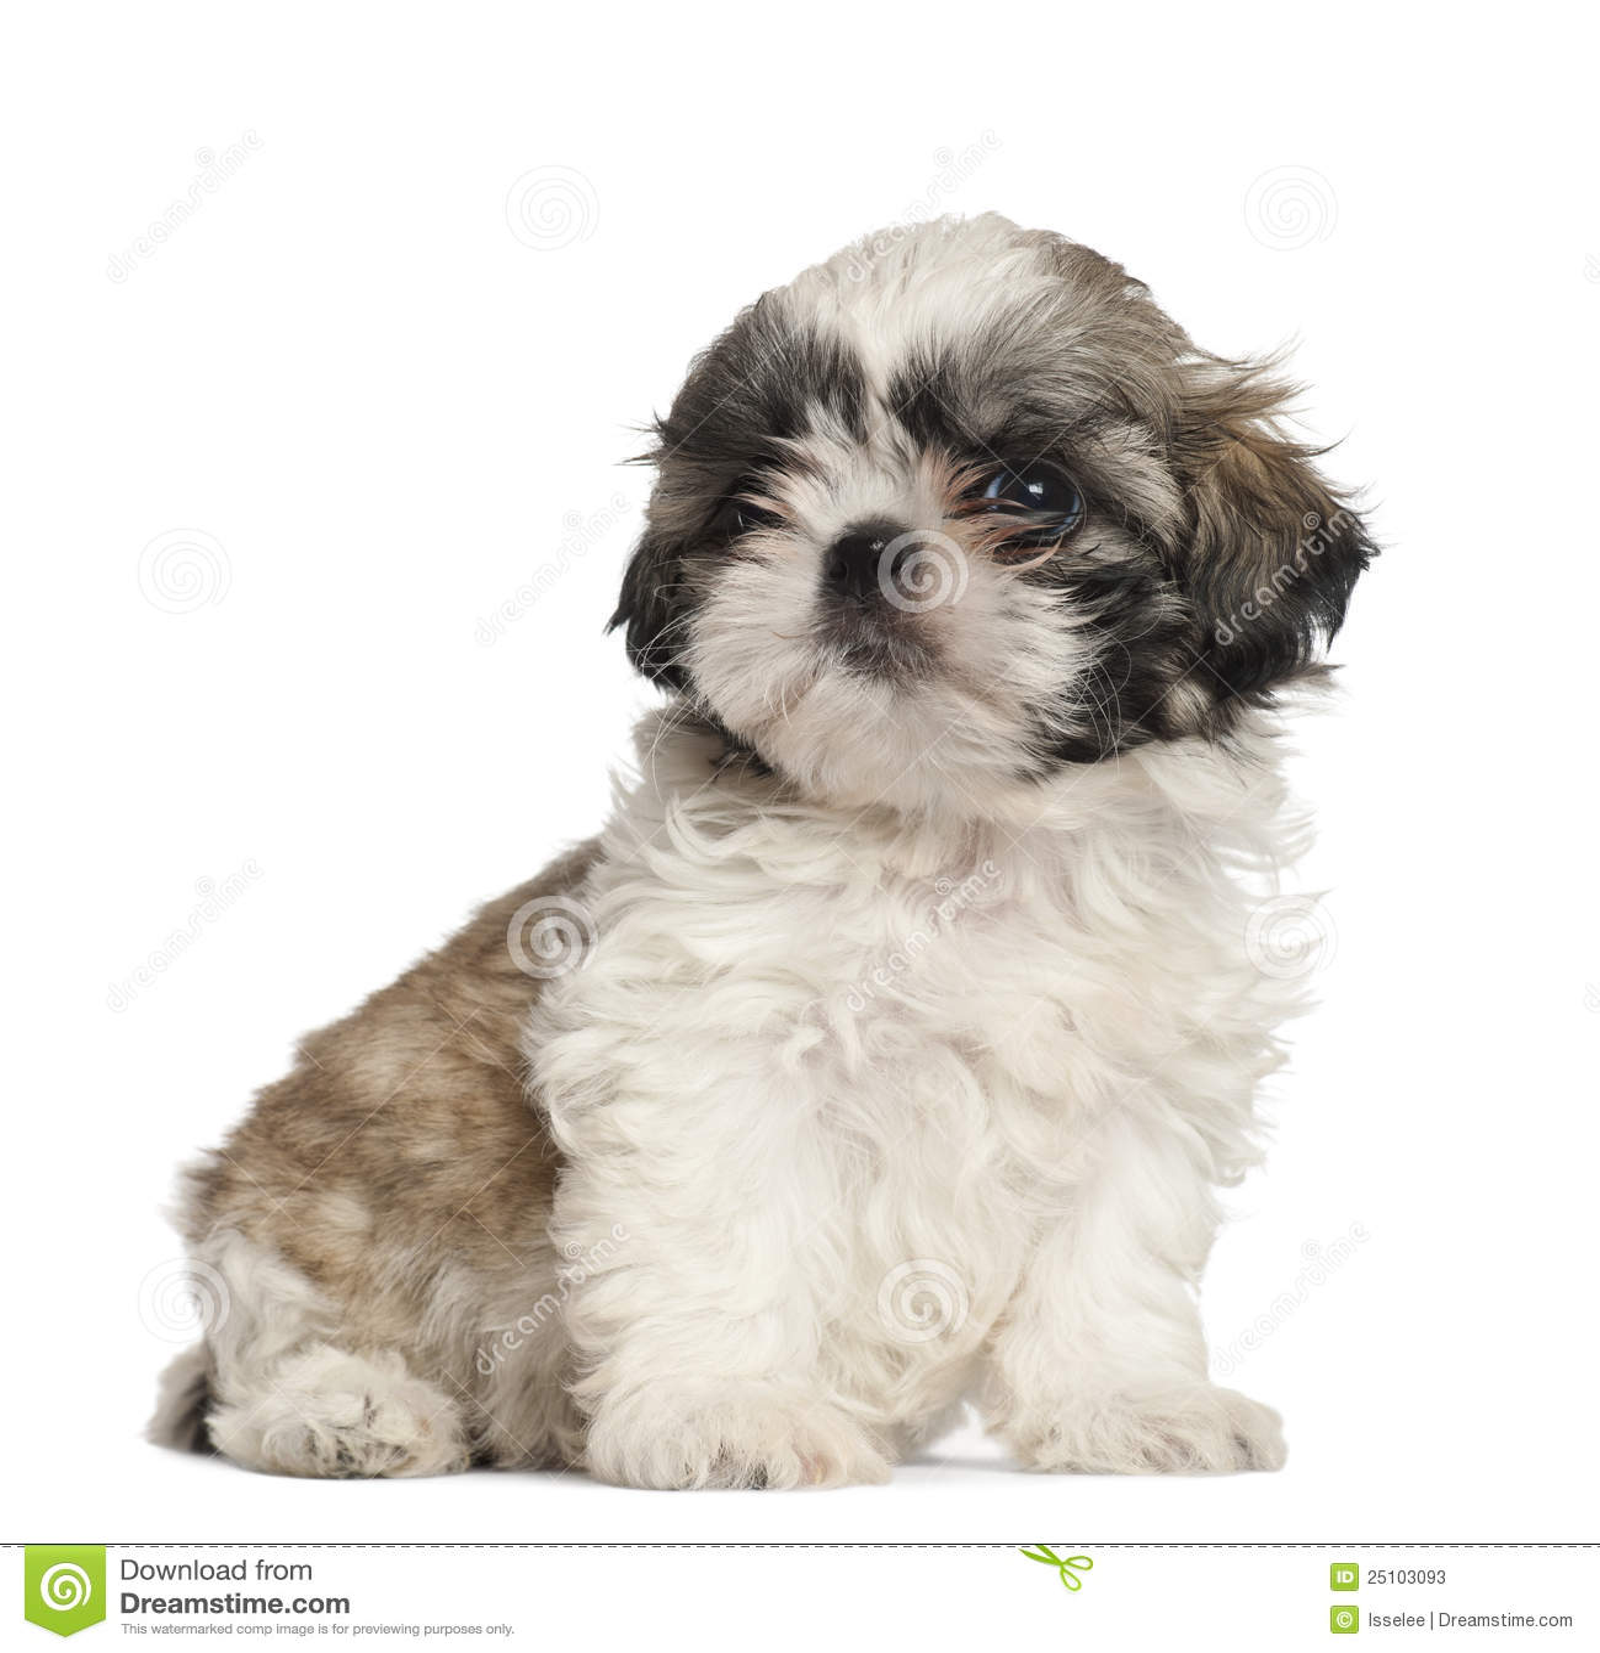 Shih Tzu Puppy, 2 Months Old, Sitting Stock Photos - Image: 25103093